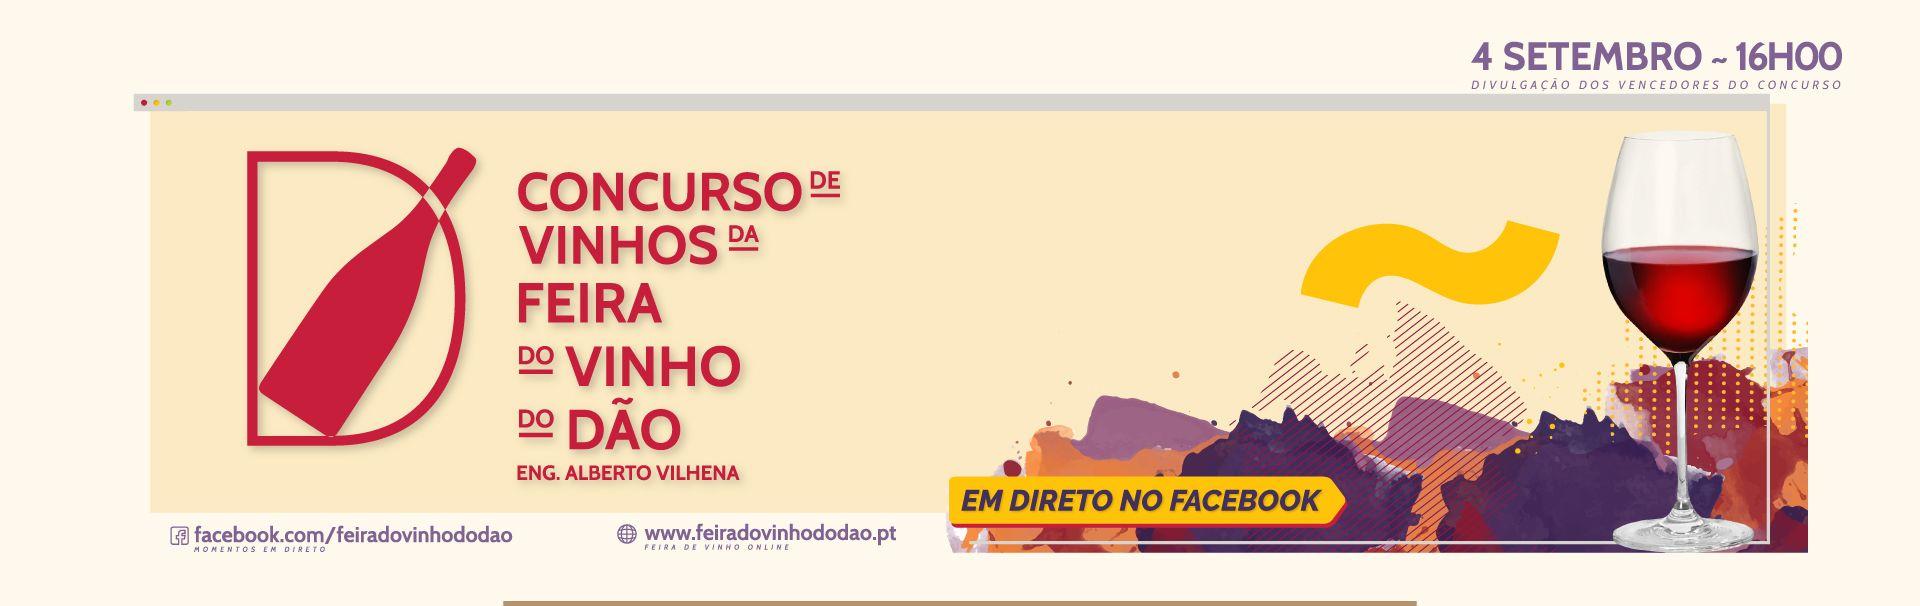 banner_Concurso-de-Vinhos.jpg